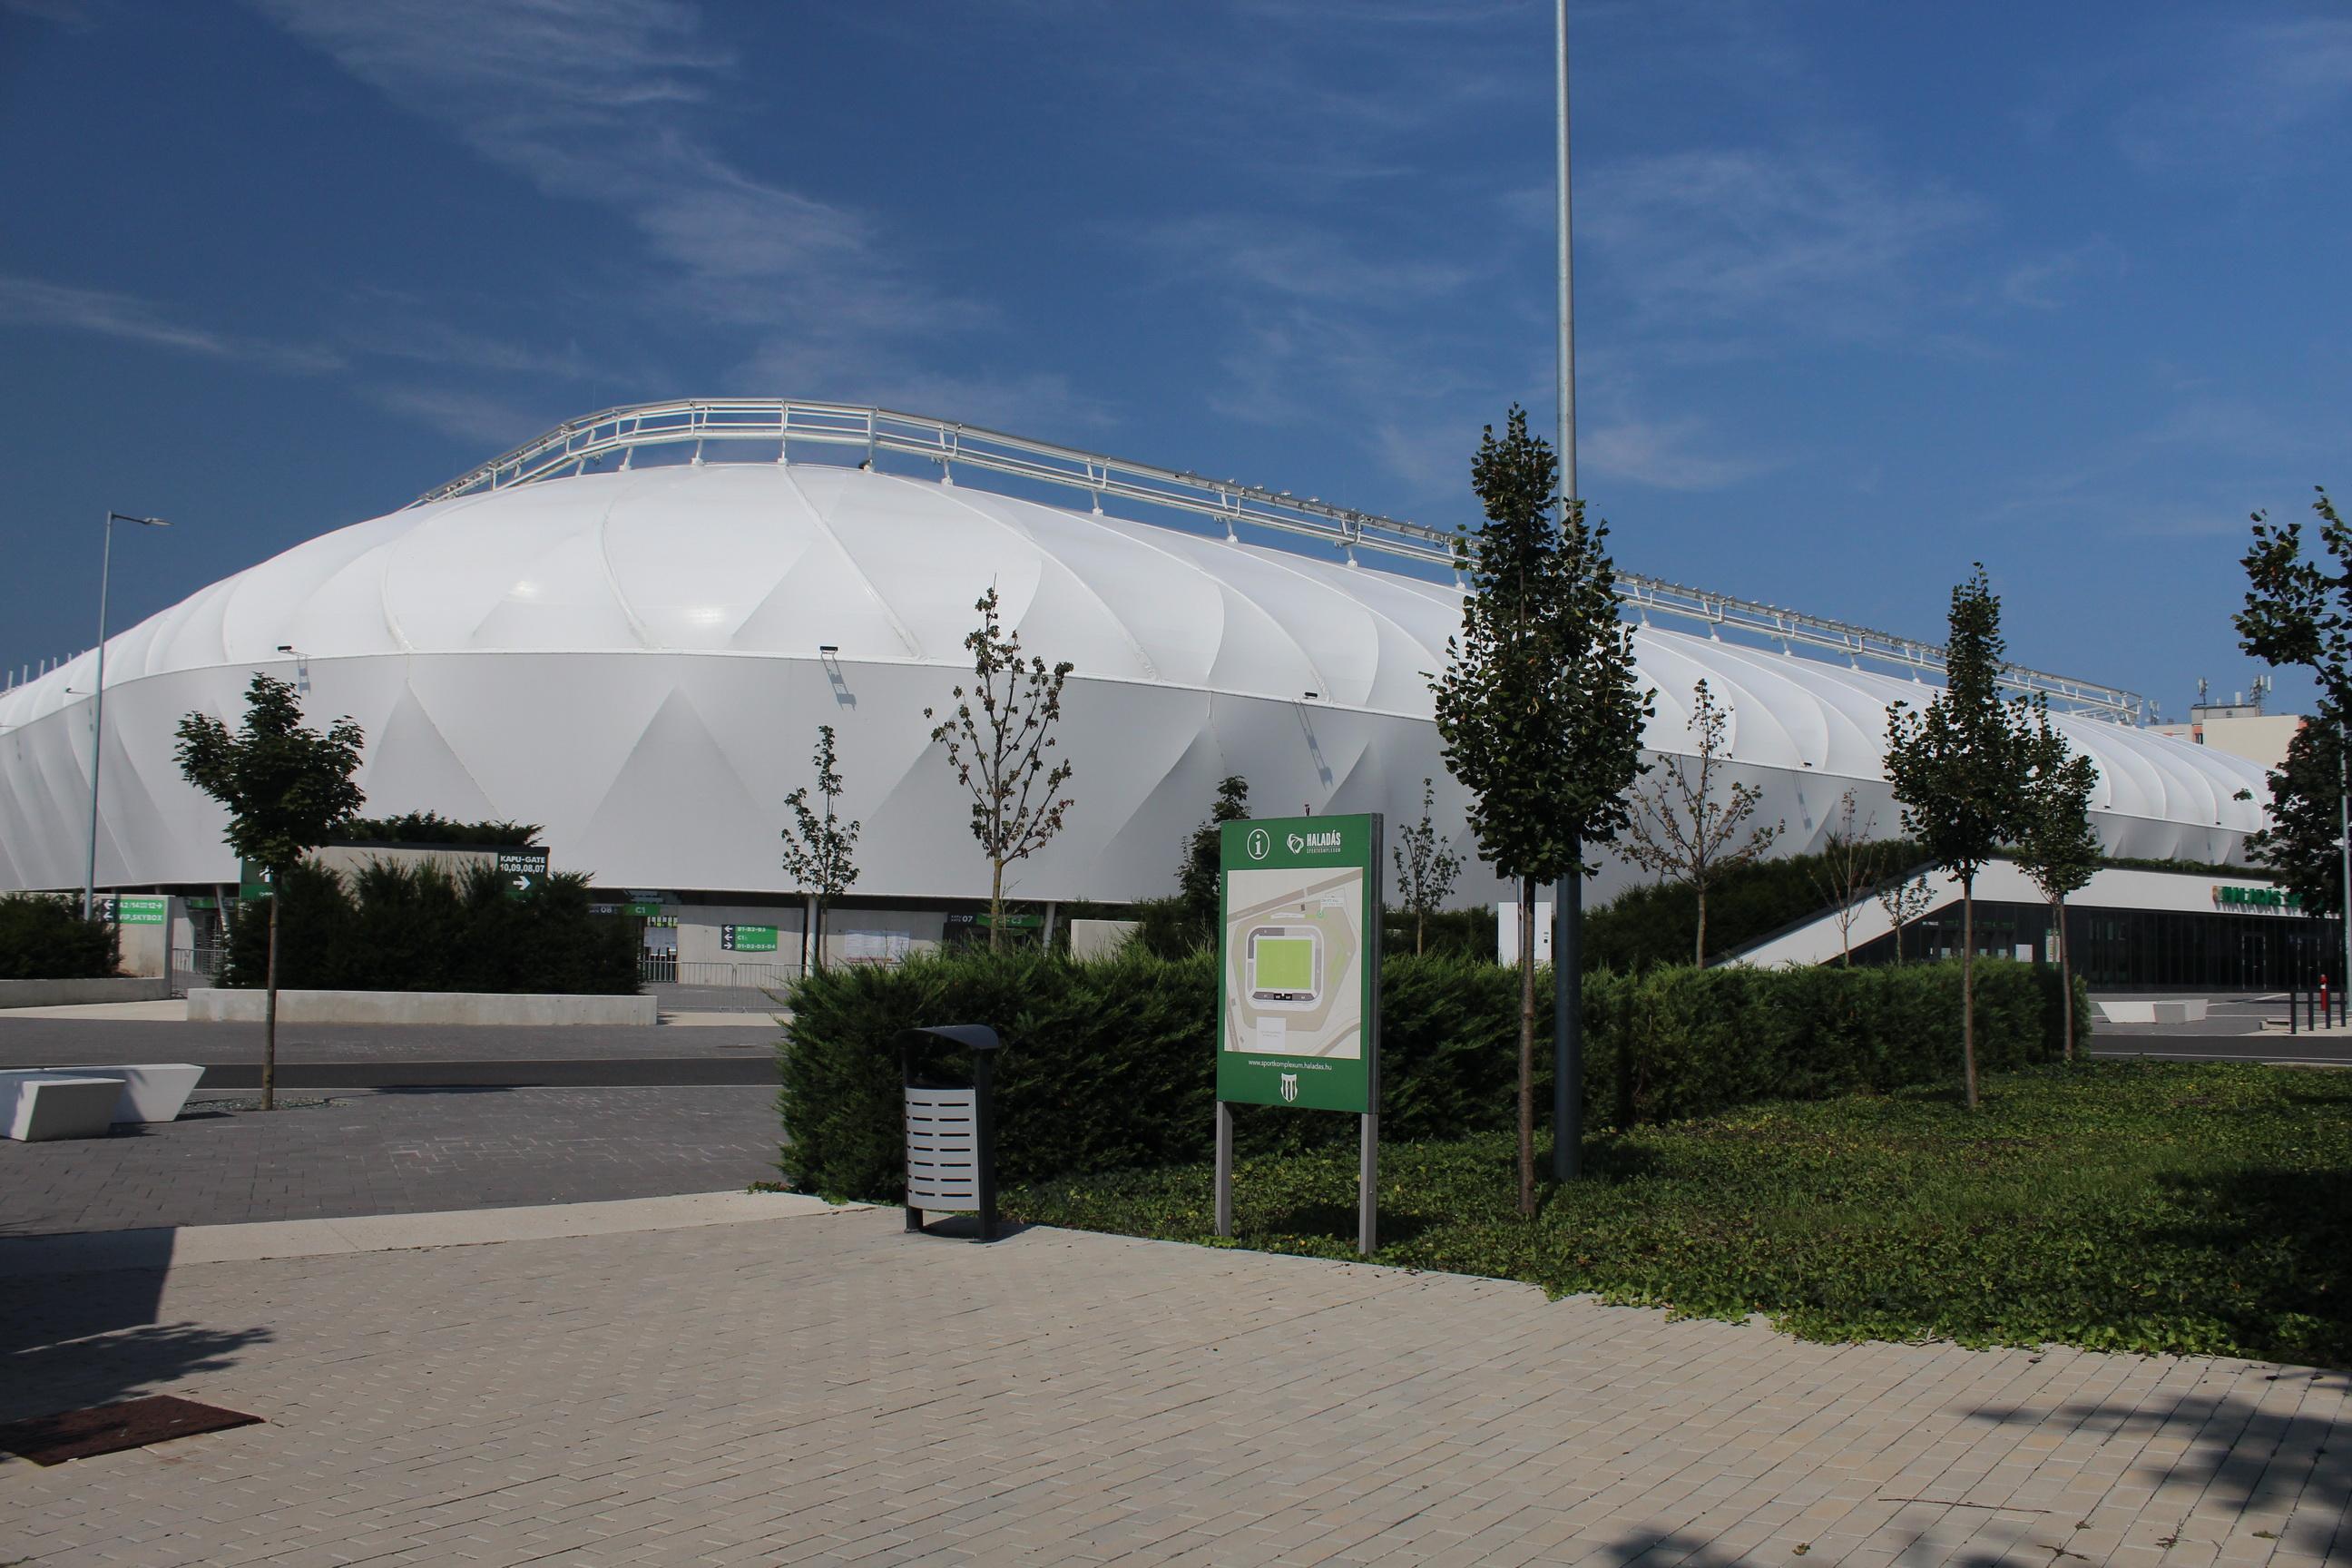 20190820-03-szombathely-haladasstadion.jpg